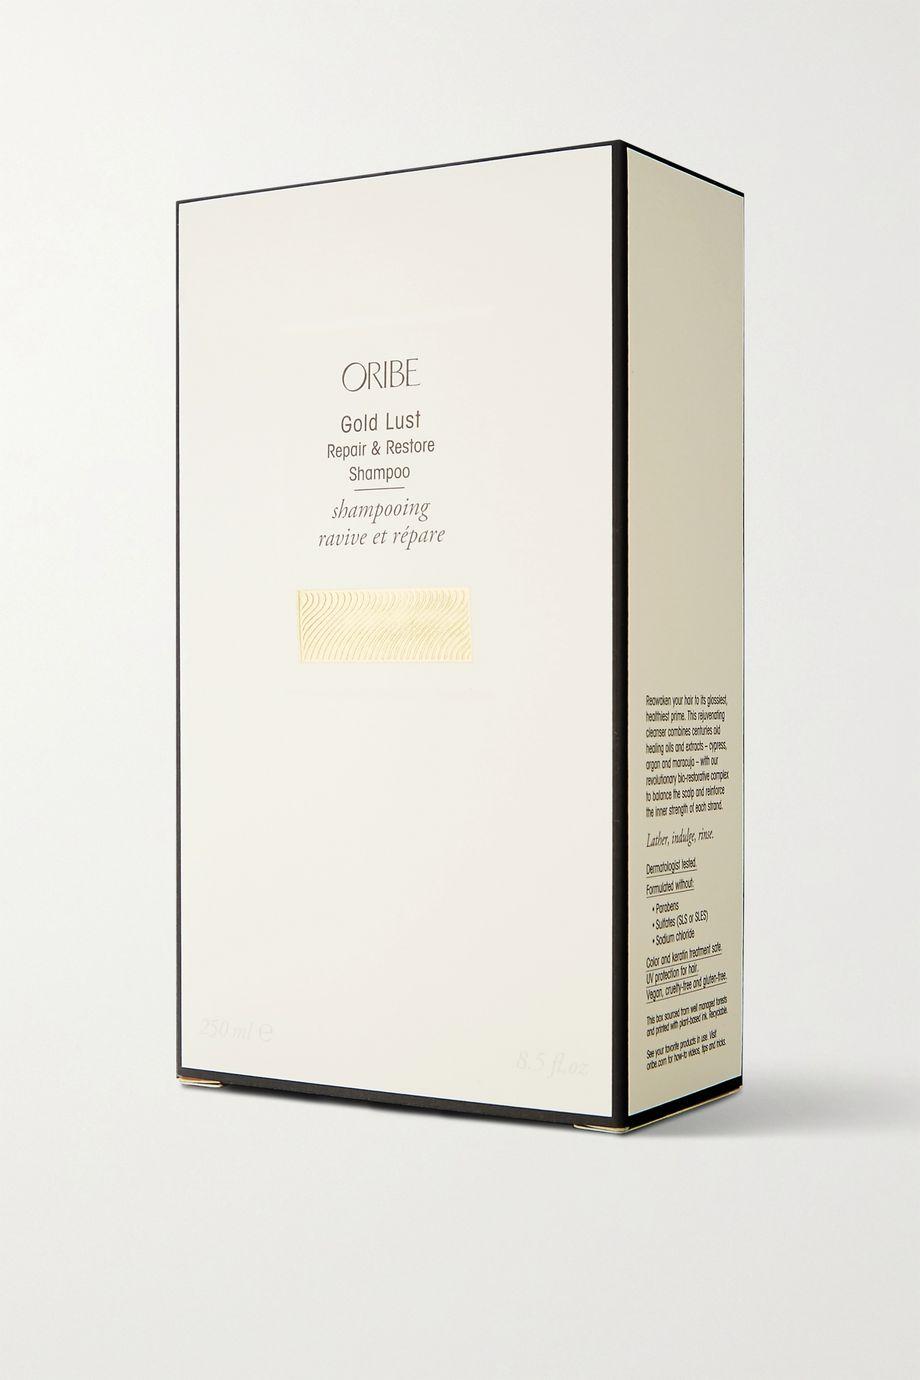 Oribe Gold Lust Repair & Restore Shampoo, 250ml